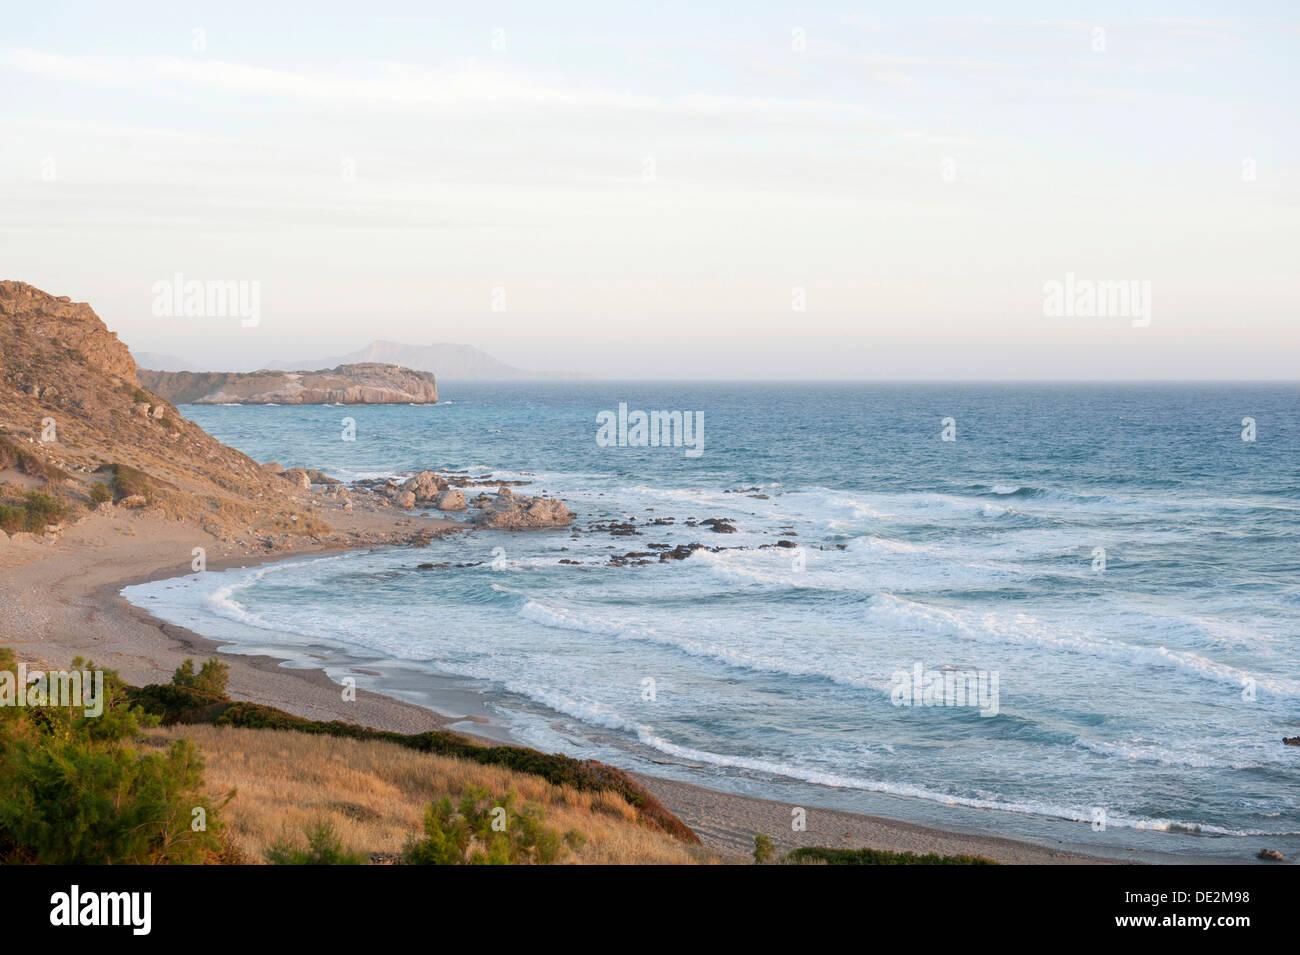 Secluded bay, surf, foaming waves, Triopetra, Agios Pavlos, Crete, Libyan Sea, Mediterranean, Greece, Europe - Stock Image